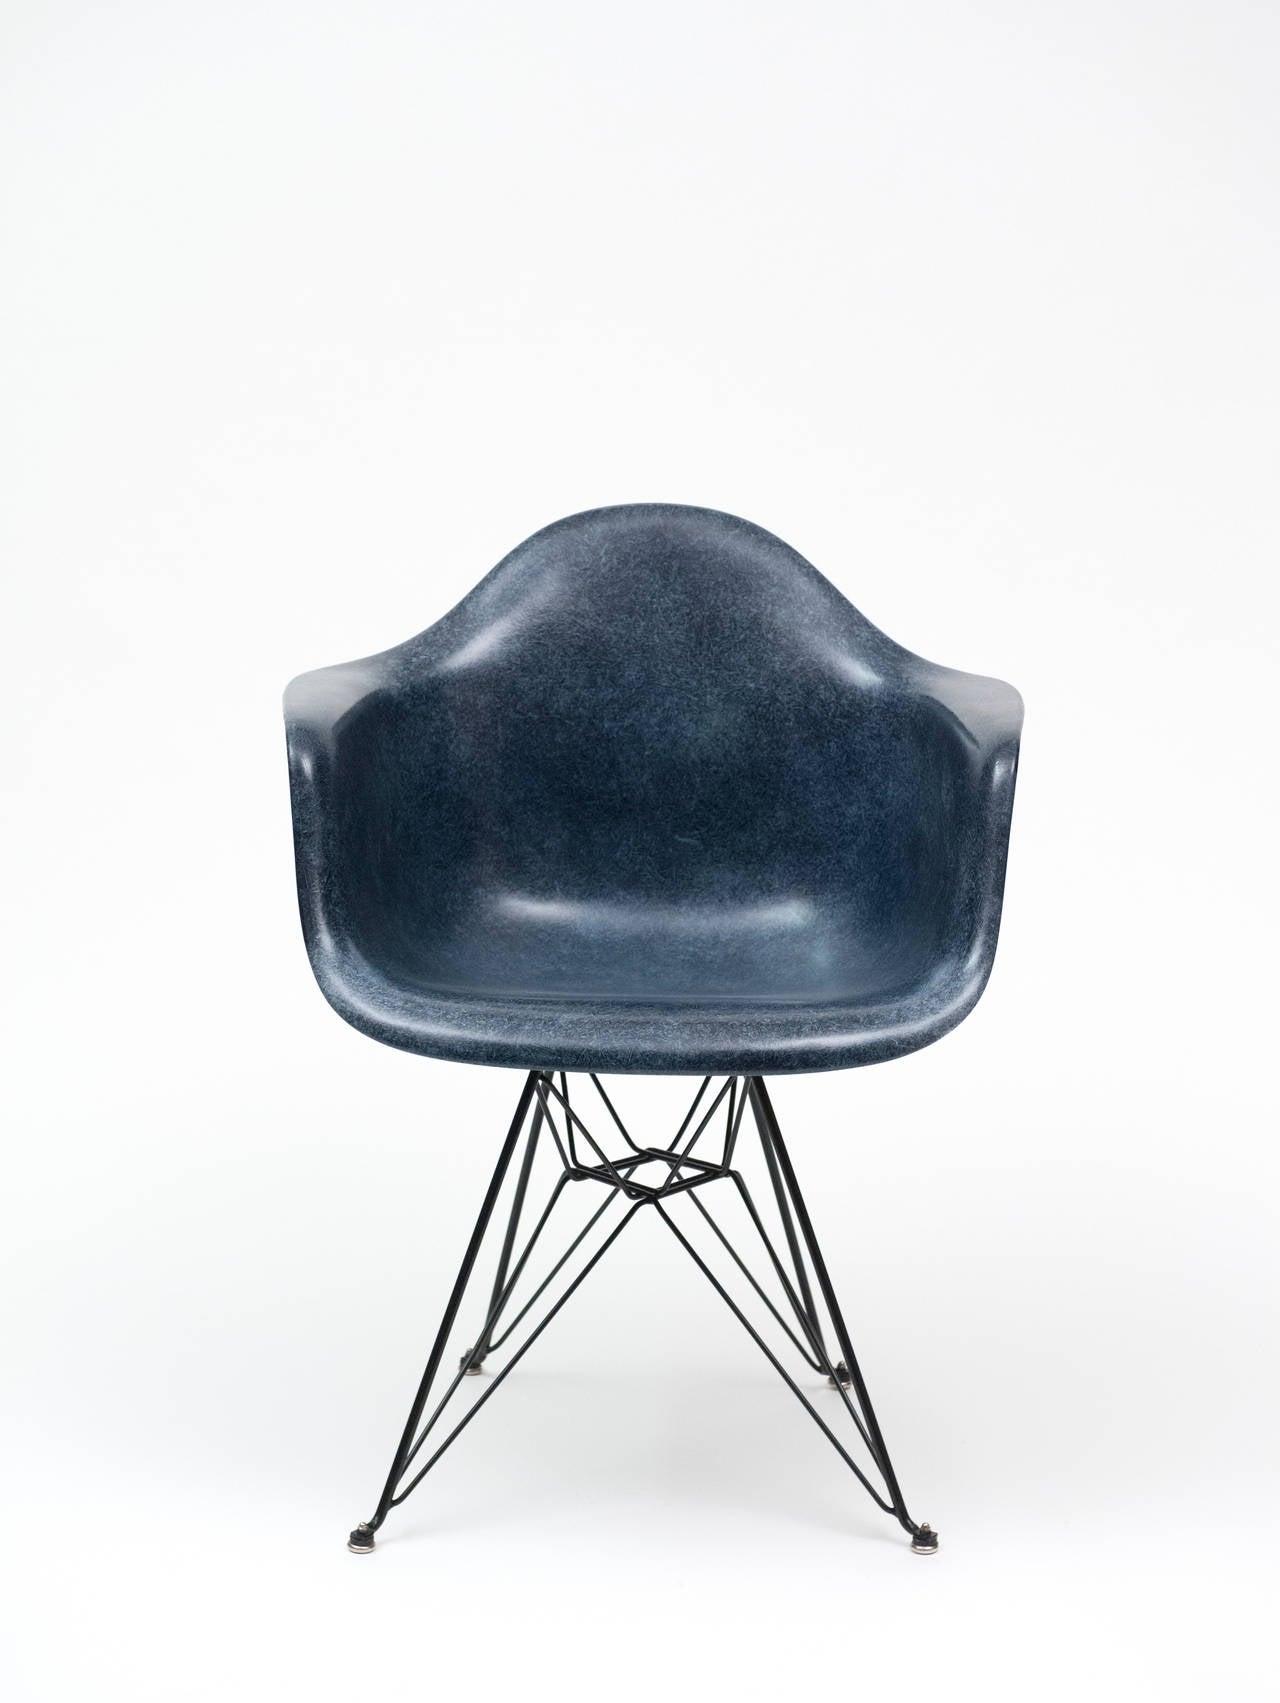 Eames Navy Blue Herman Miller Dar Shell Chair With Eiffel